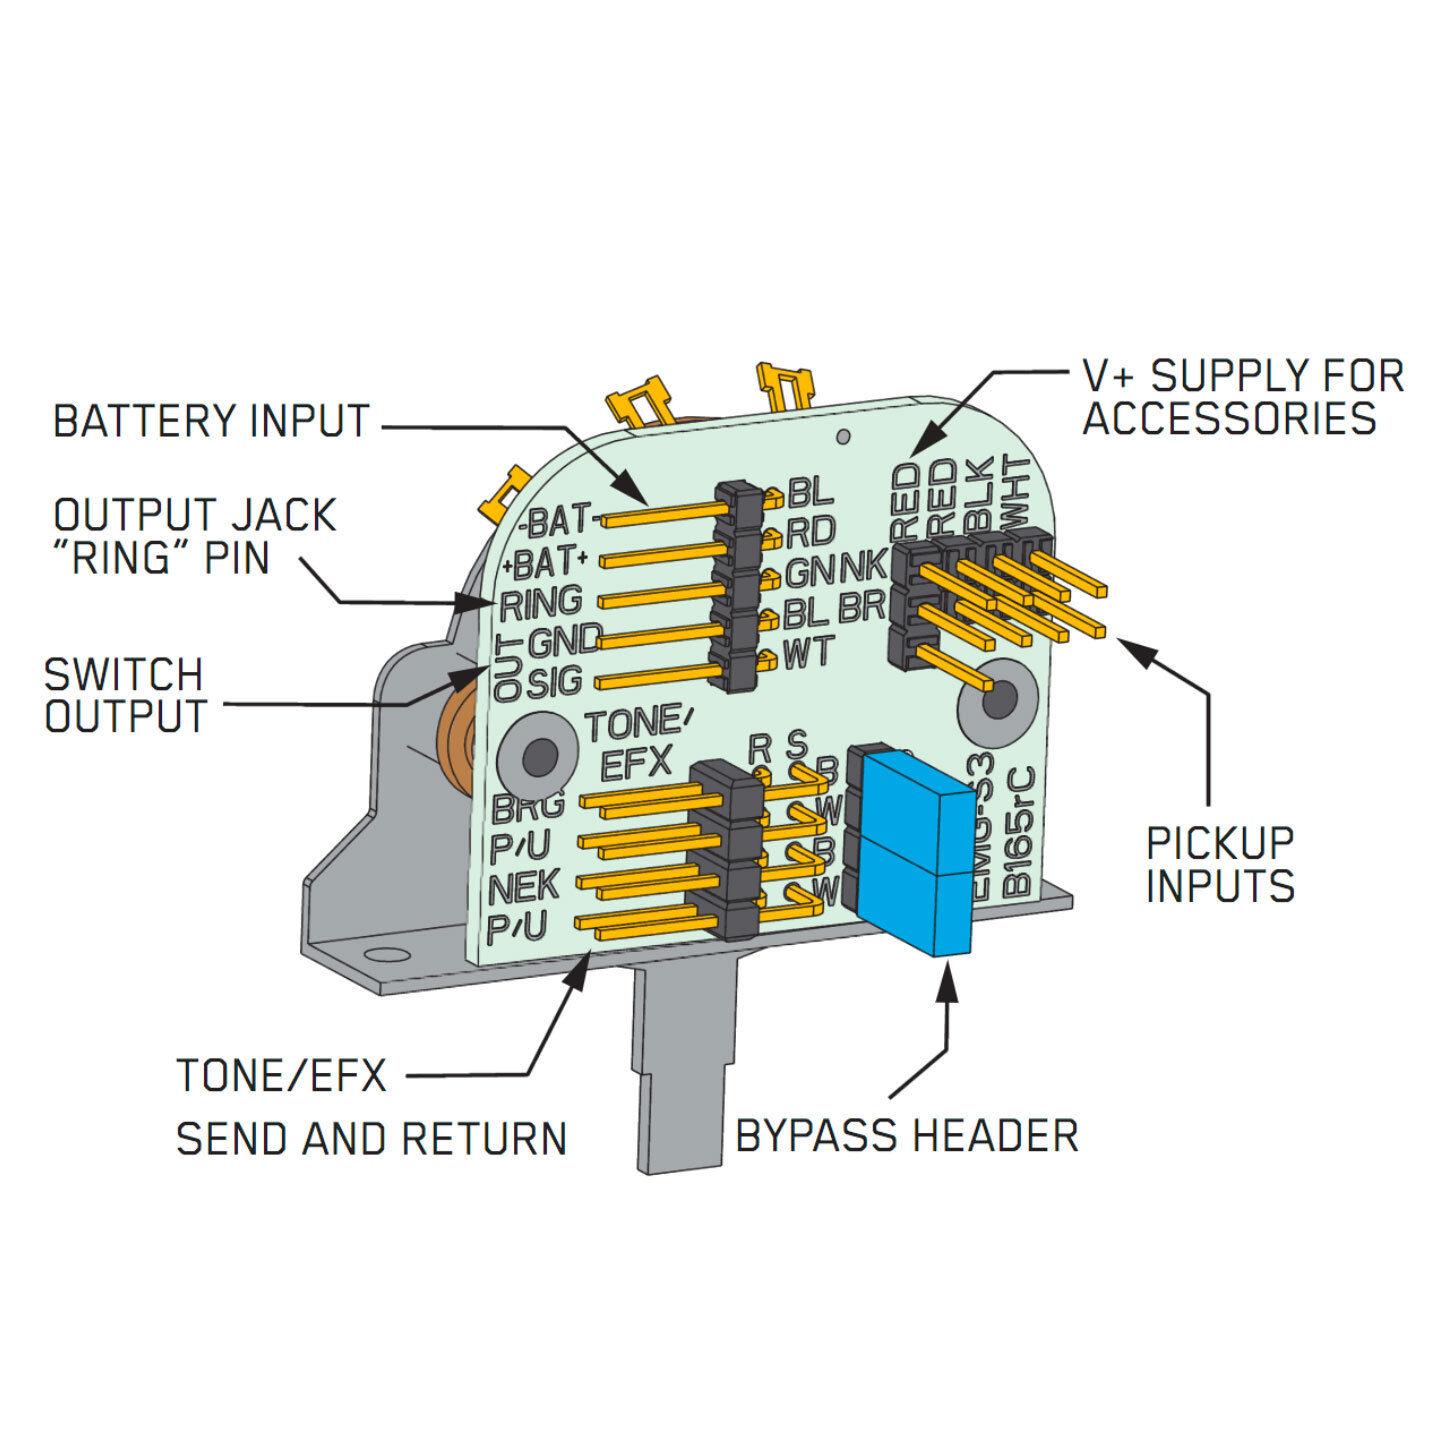 Emg Jazz B Wiring Diagram Emg Wiring Diagram 81 85 ... Jazz B Special Wiring Diagram on